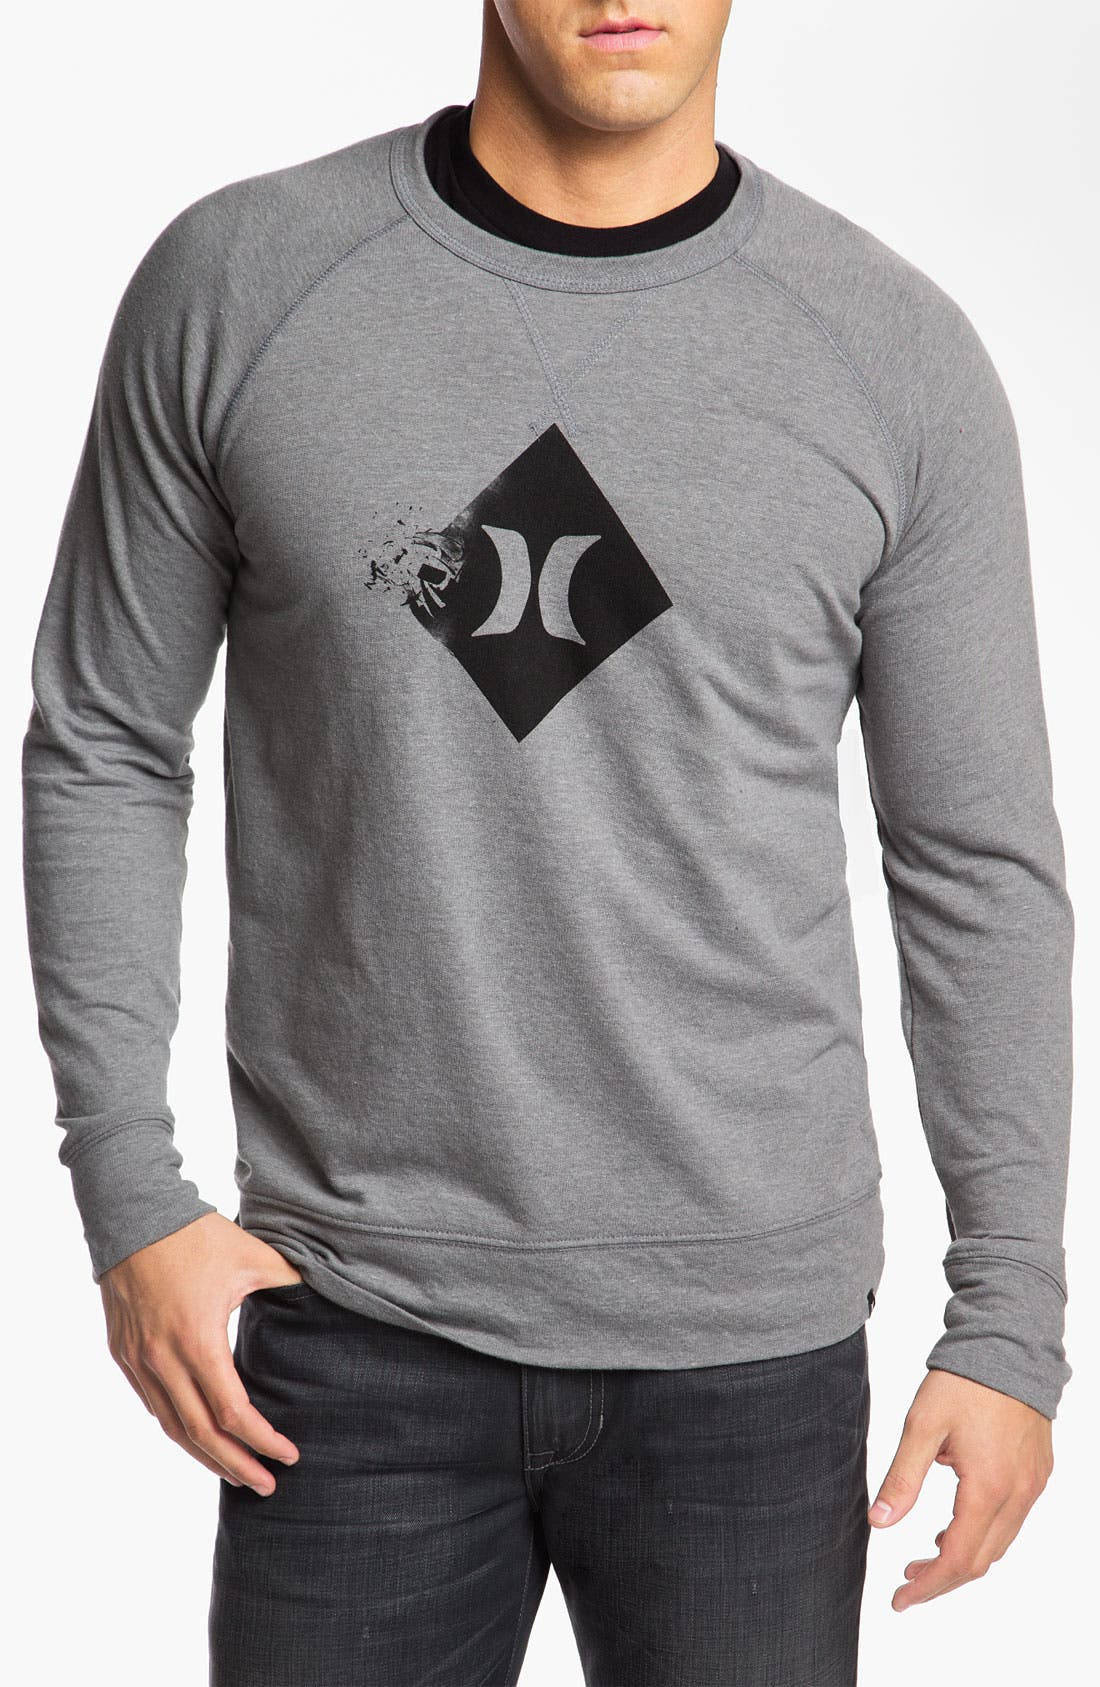 Main Image - Hurley 'Broken' Graphic Crewneck Sweatshirt